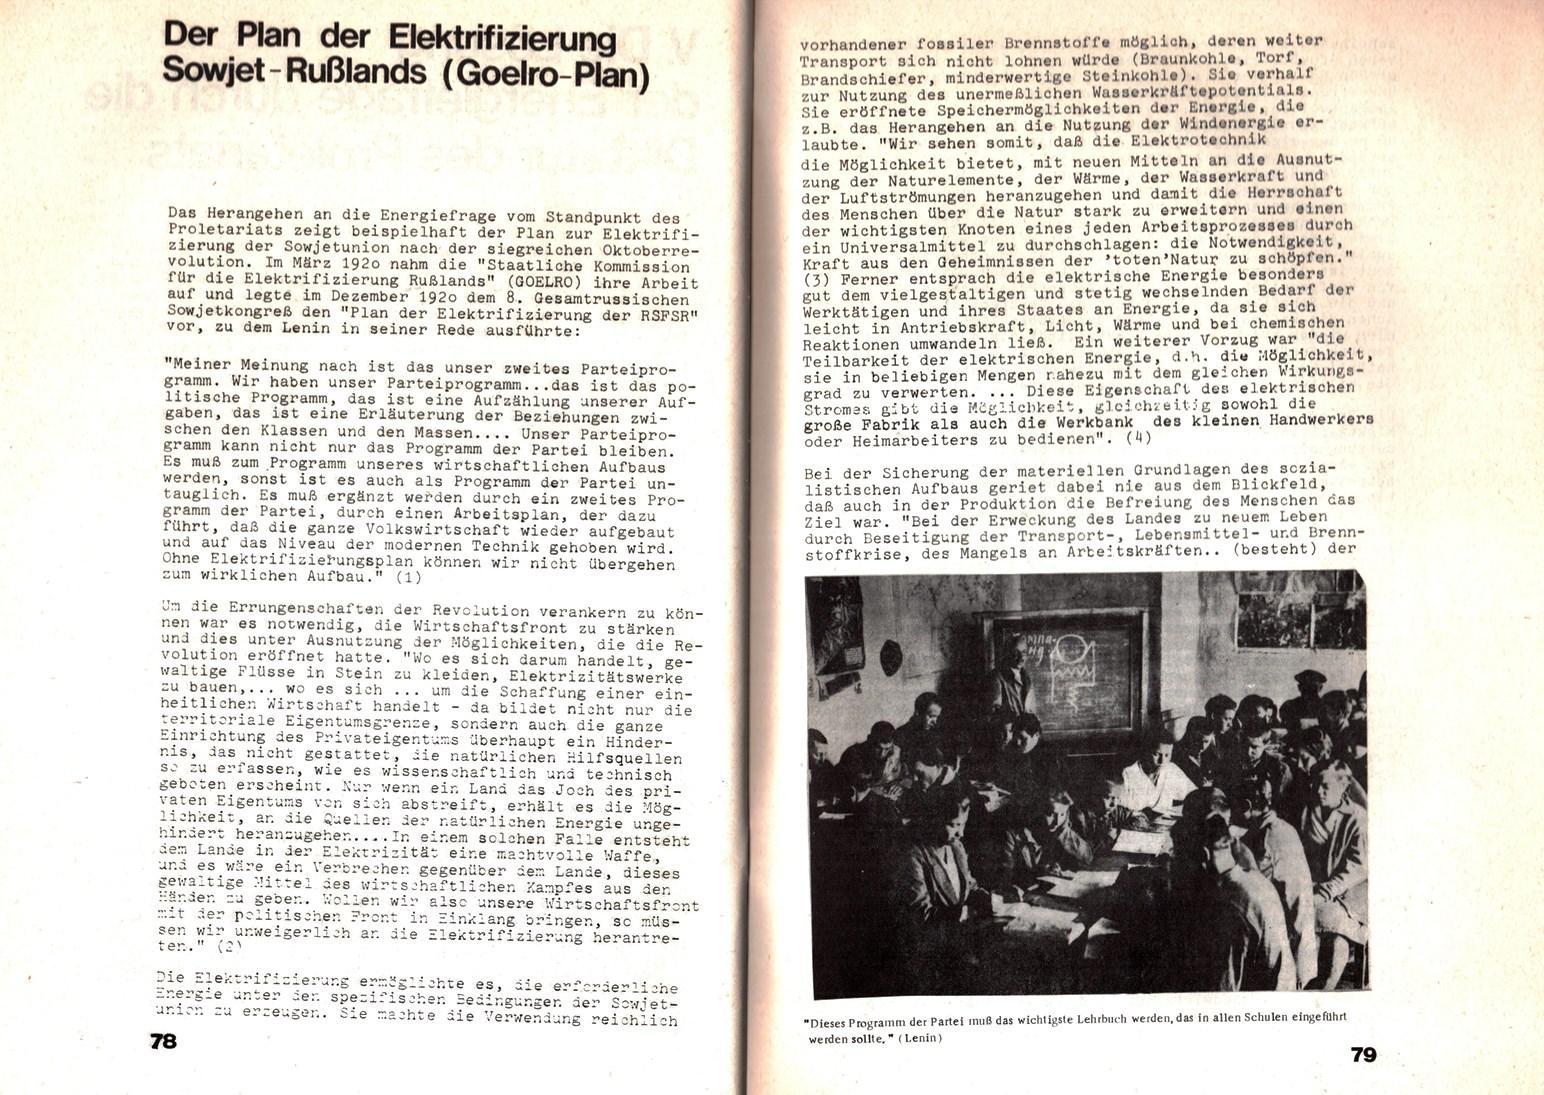 KSV_1976_Atomenergie_im_Kapitalismus_041